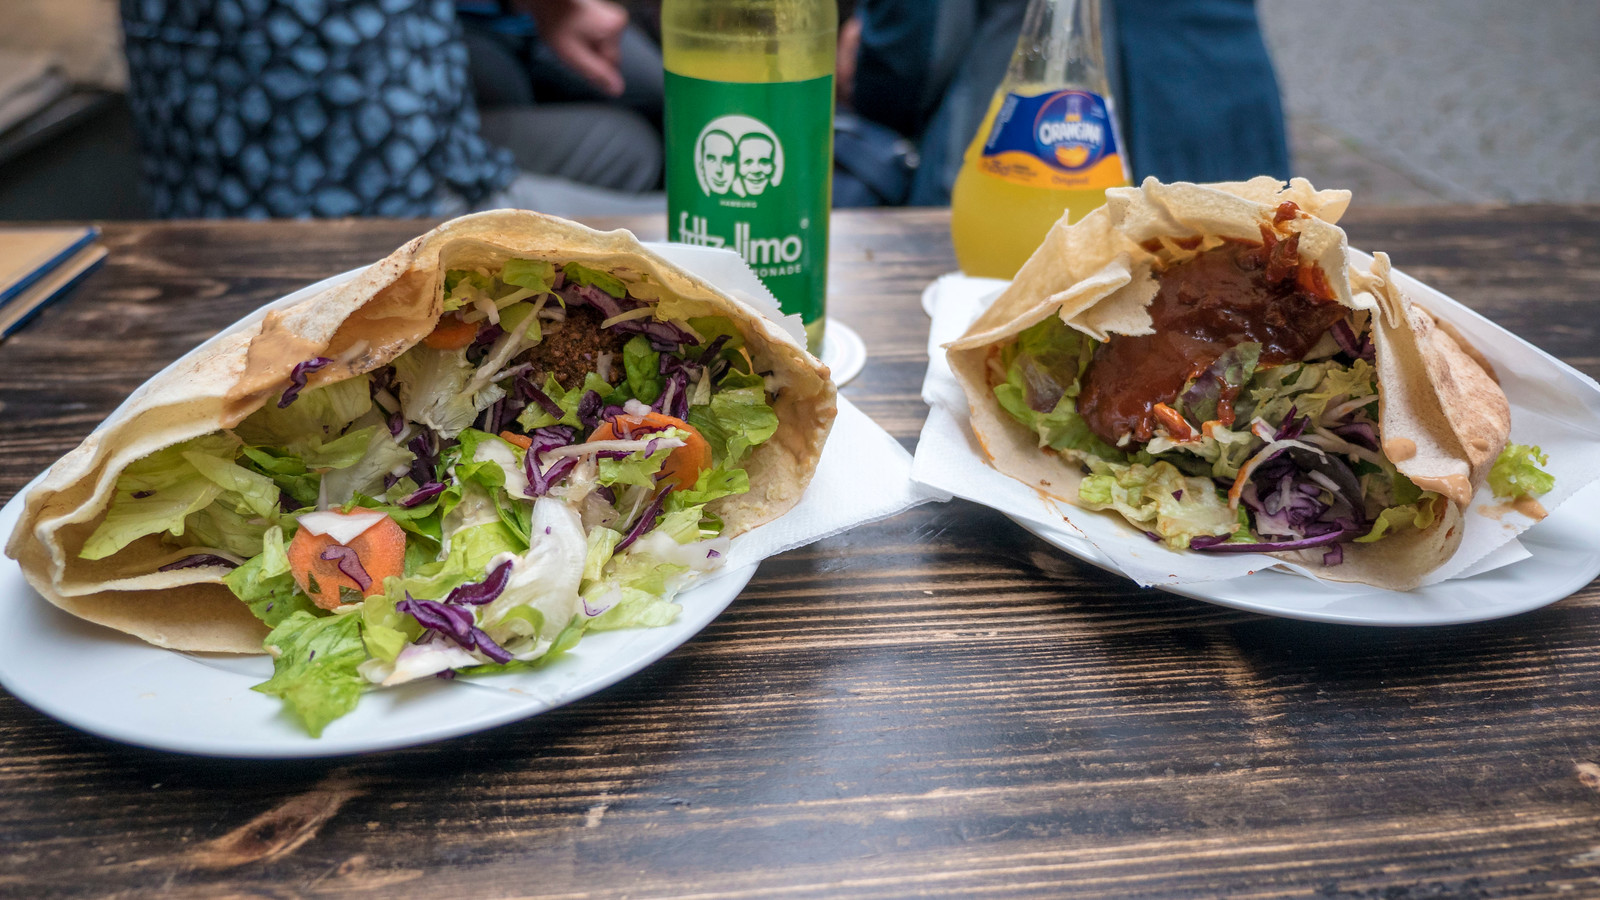 Vegi. Vegan pitas. Things to do in Tubingen Germany.